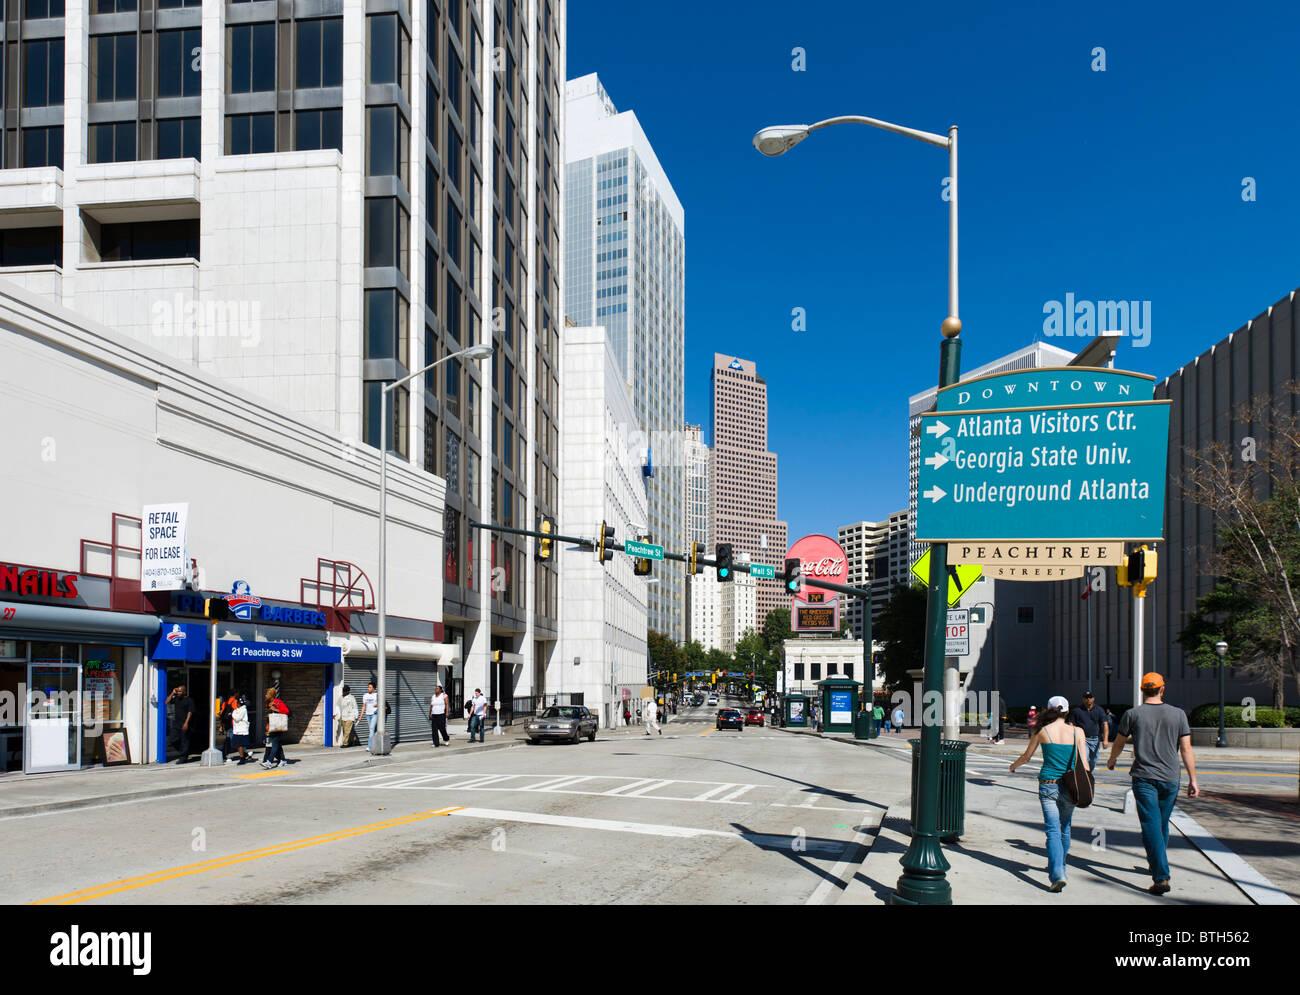 Peachtree Street looking towards Five Points, Downtown Atlanta, Georgia, Usa, USA - Stock Image